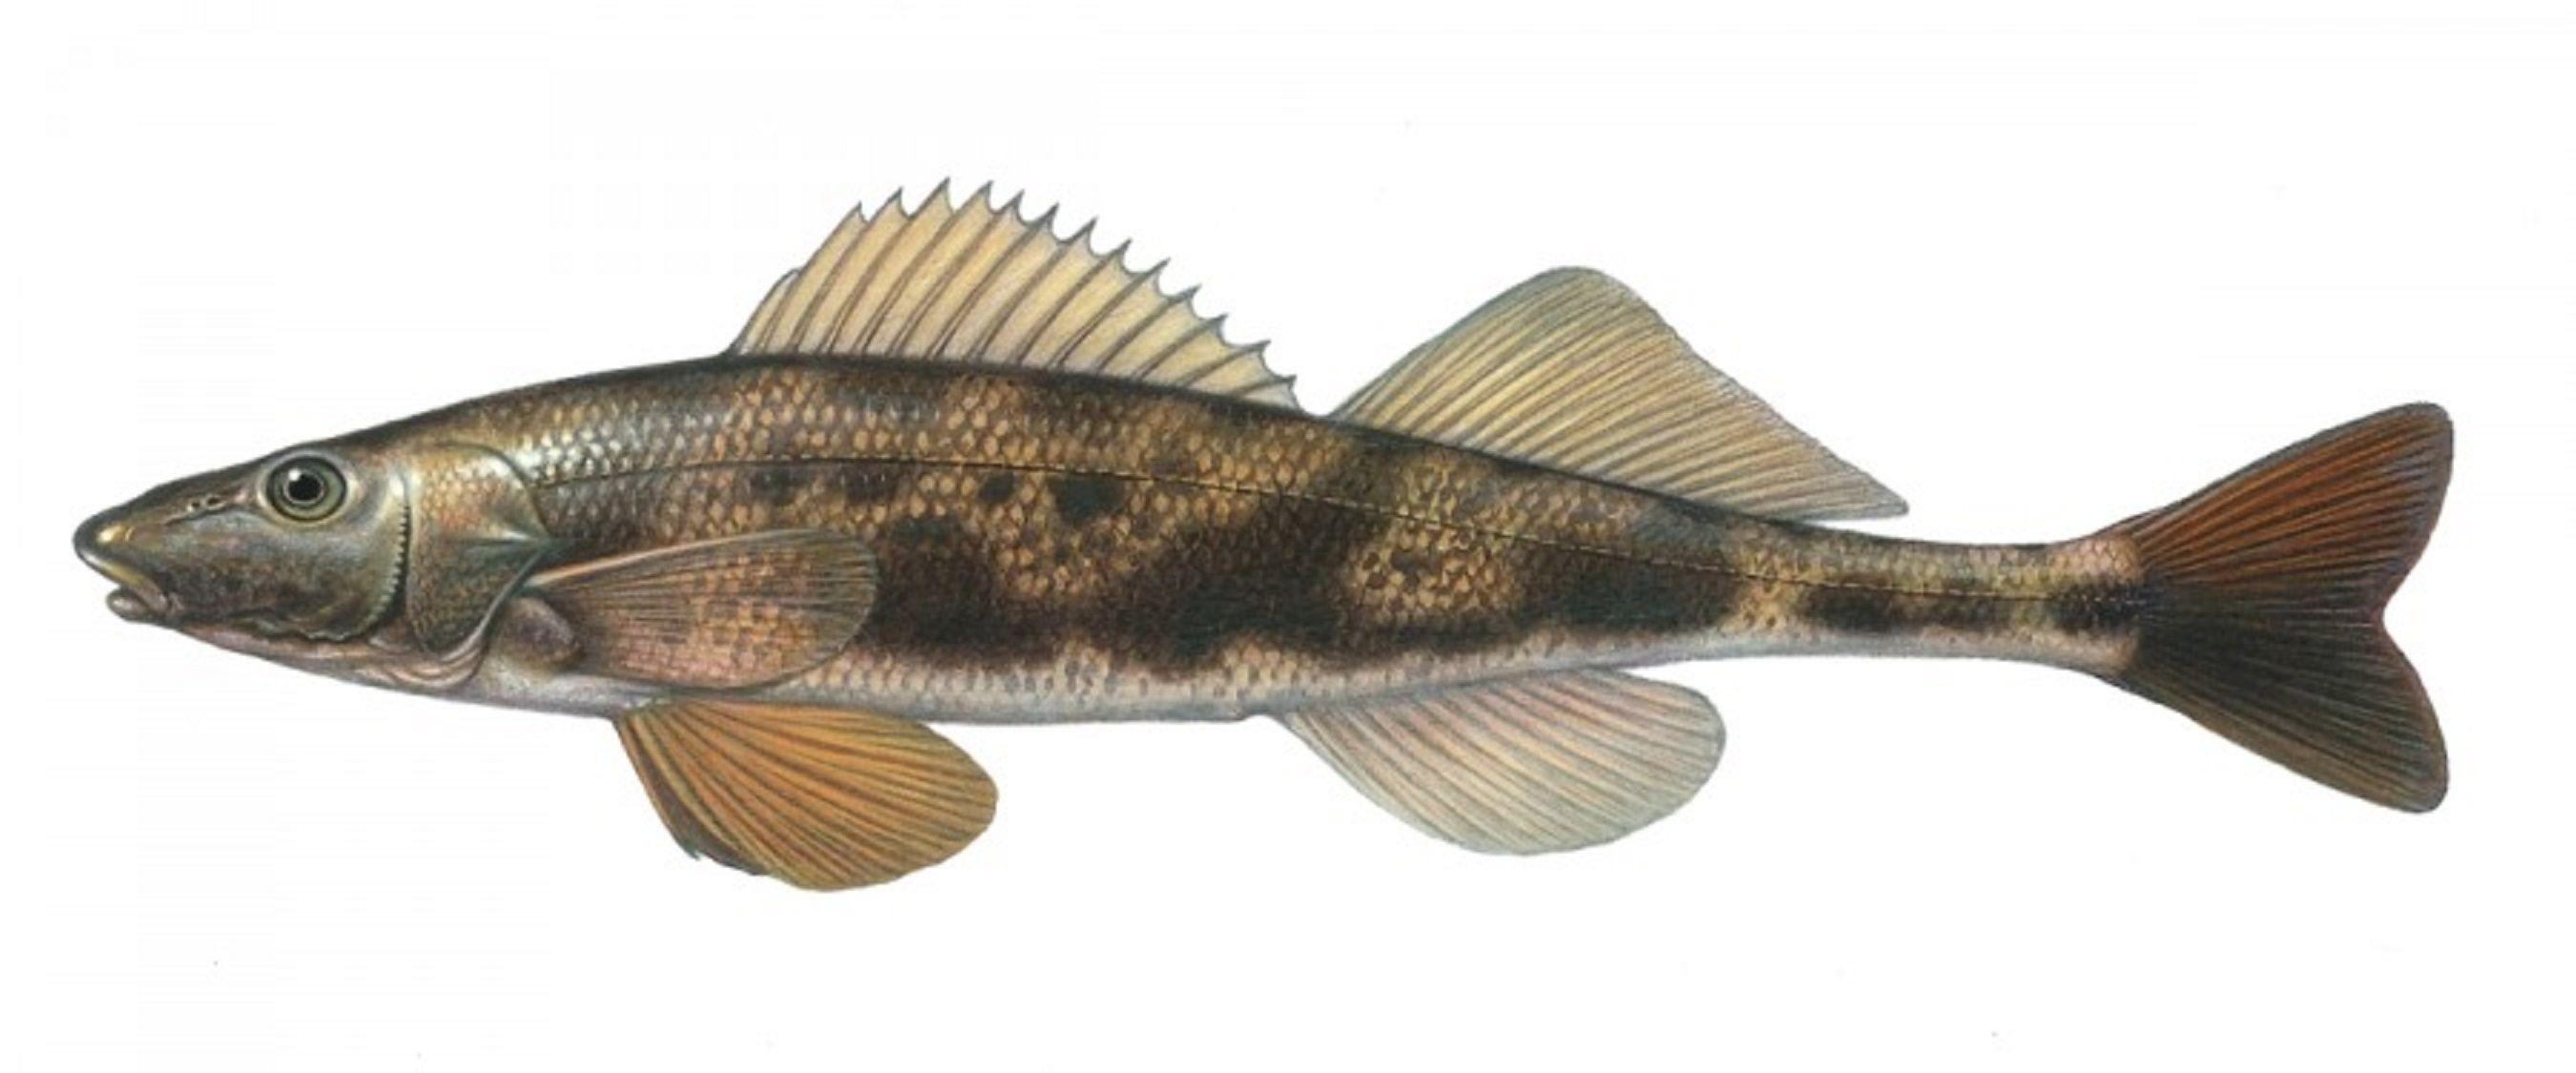 Freshwater fish meaning - Art Illustration Lakes Freshwater Fish Zingel Is A Genus Of Fish